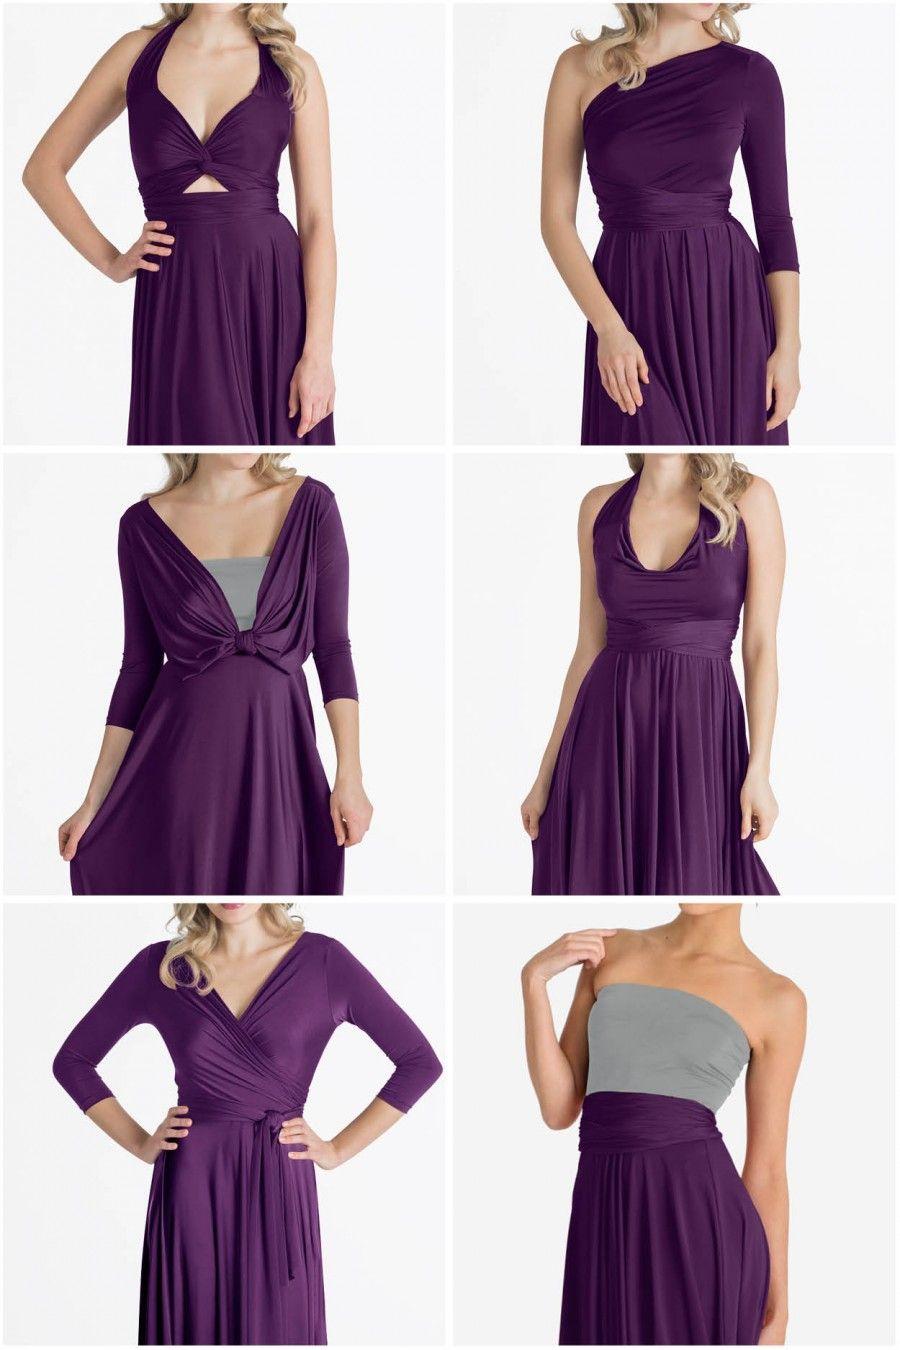 Iris Midi Convertible Dress - Made to Order